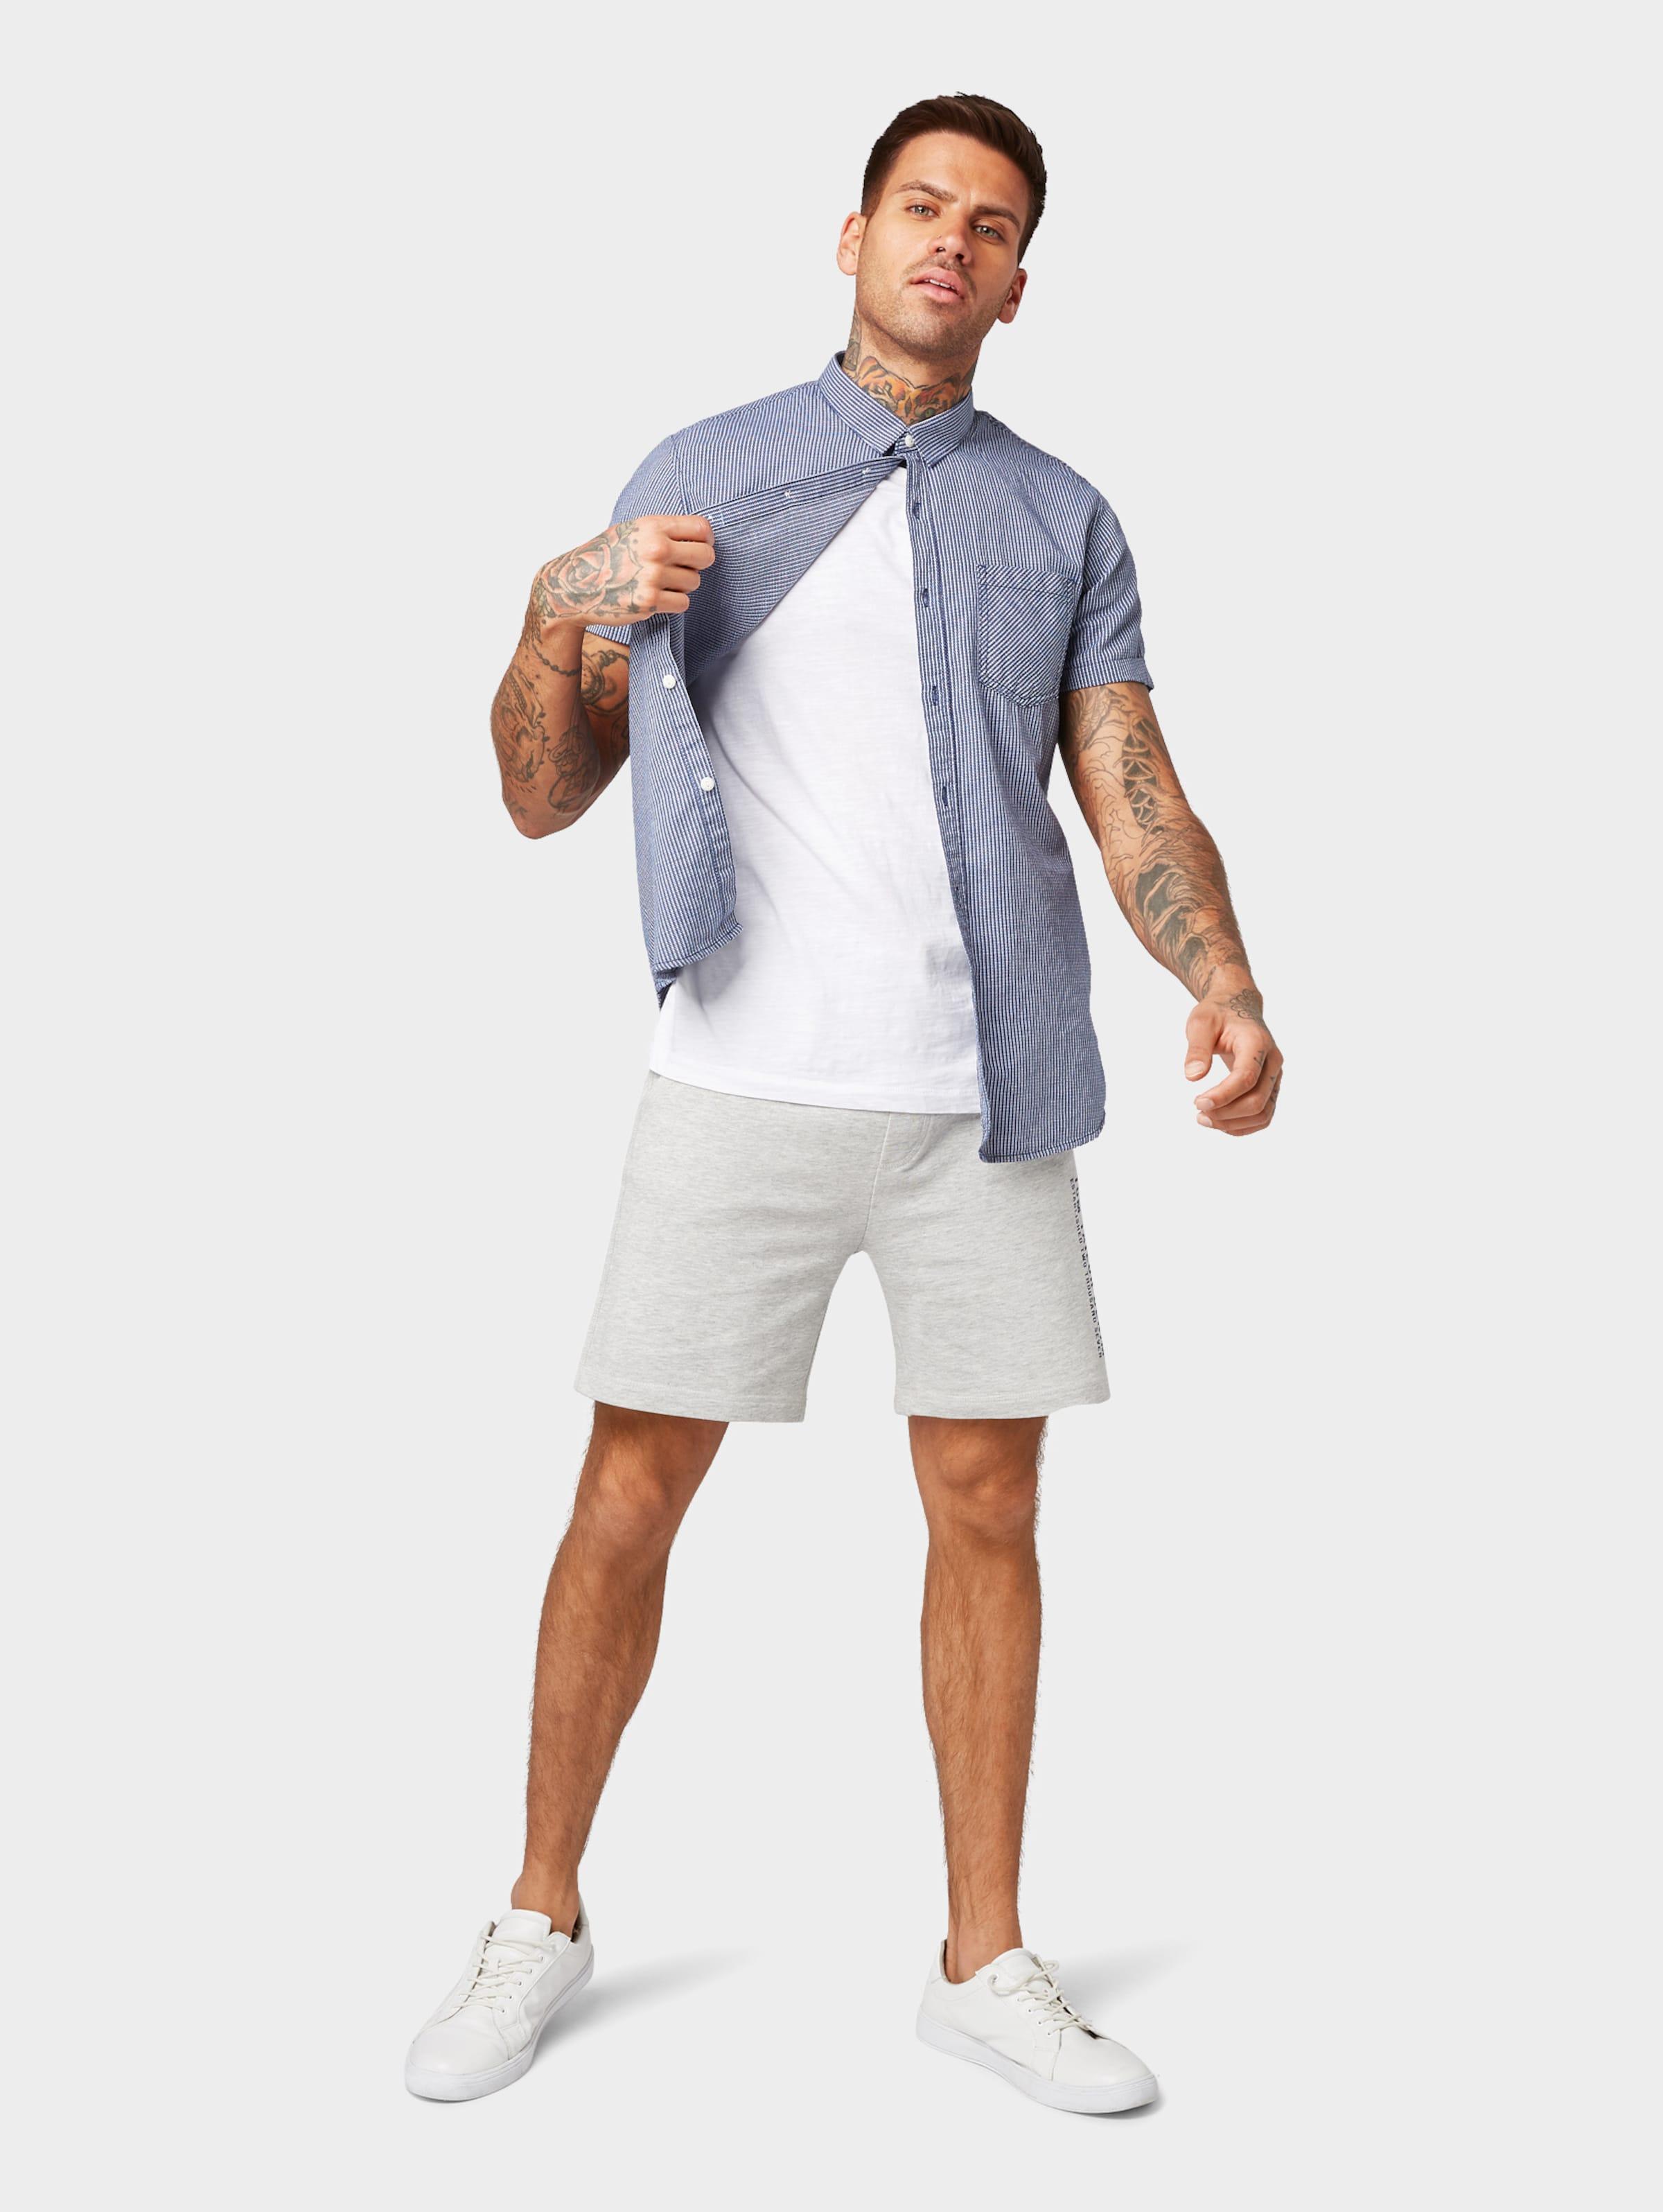 Tom In Denim NachtblauWeiß Hemd Tailor 8X0PnkwO